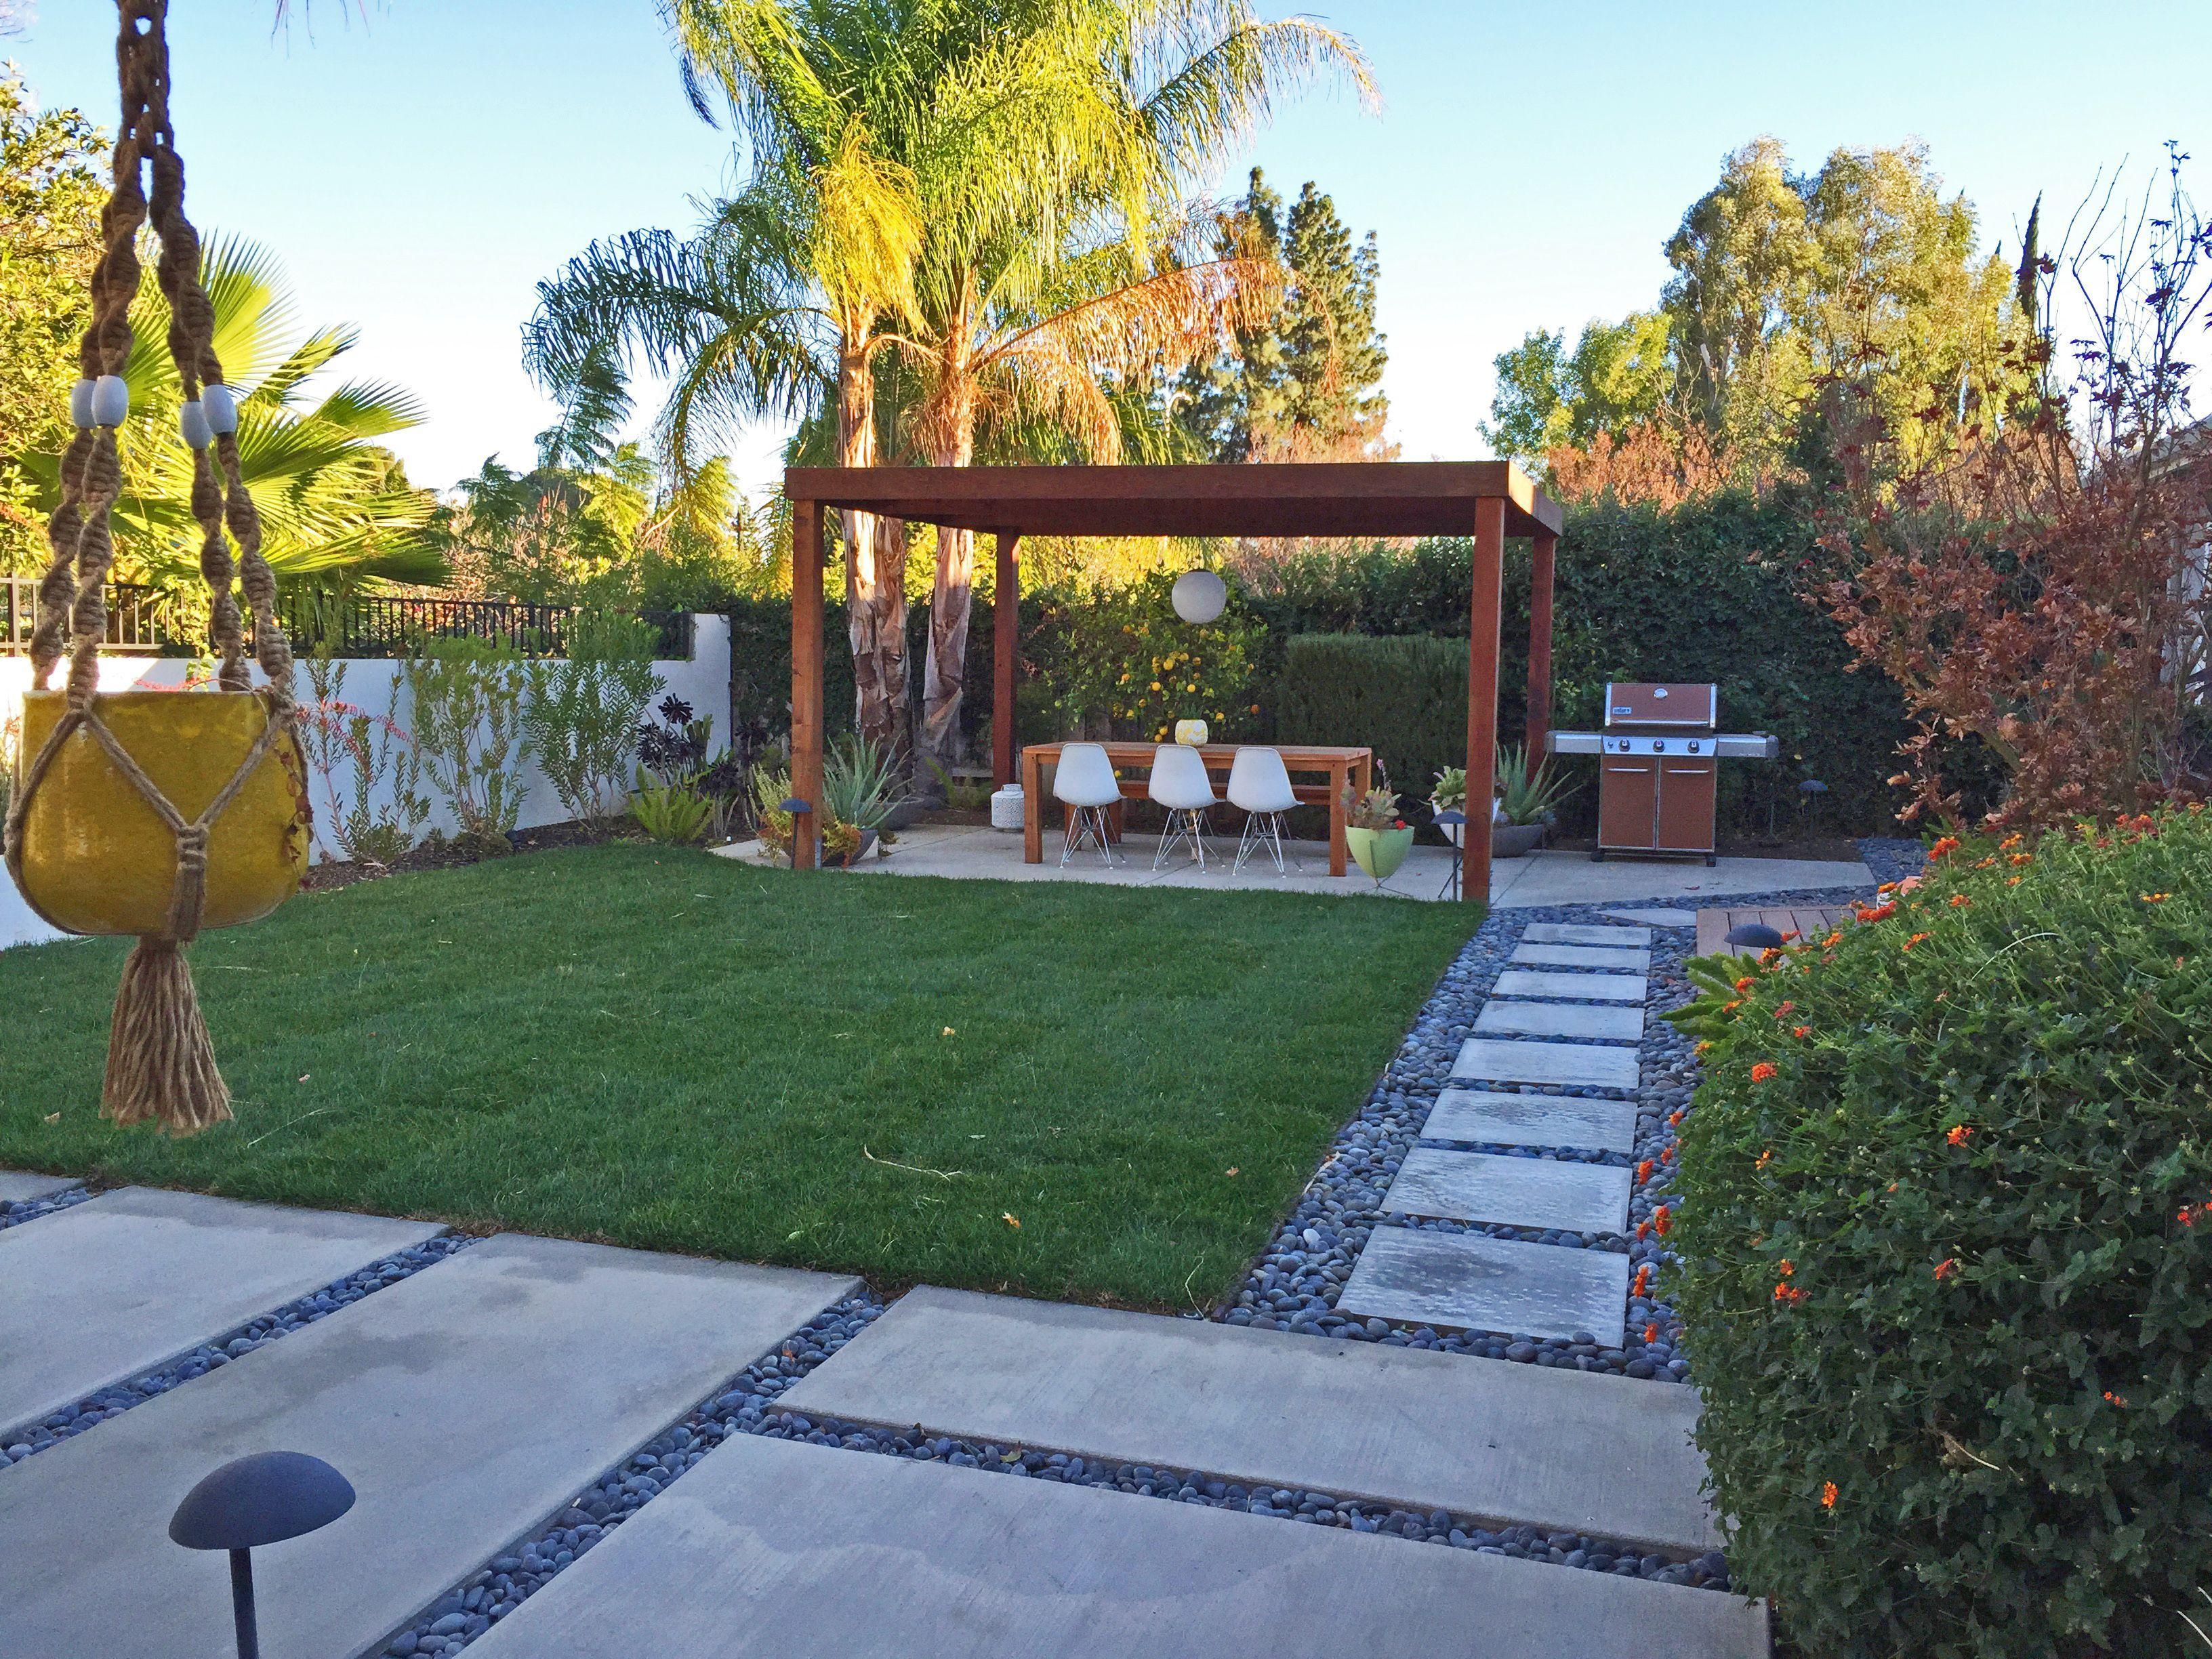 Midcentury modern backyard outdoor concrete pavers pads pergola